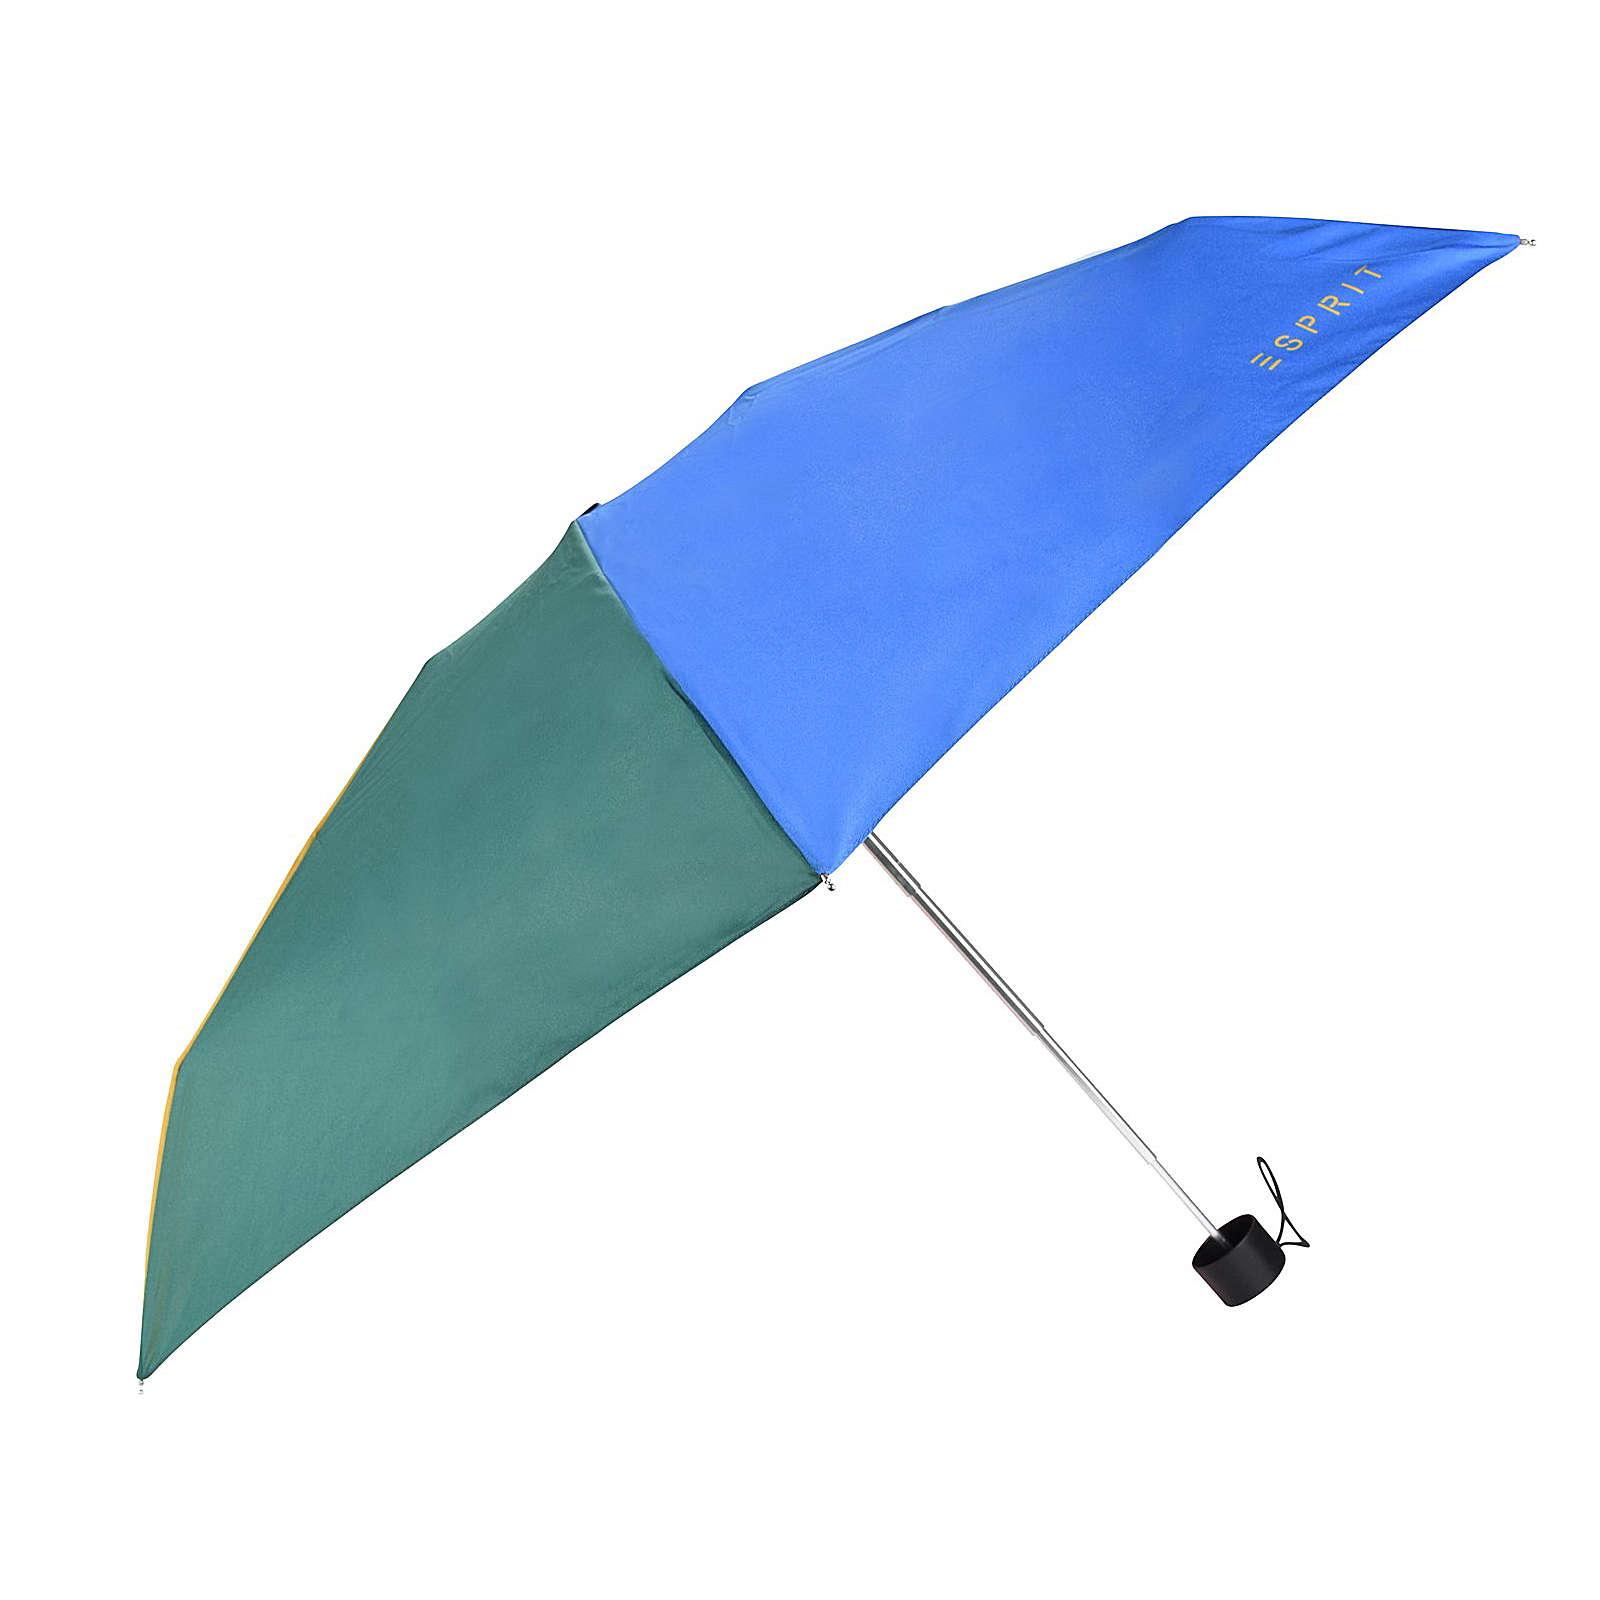 ESPRIT Regenschirm Petito bunt